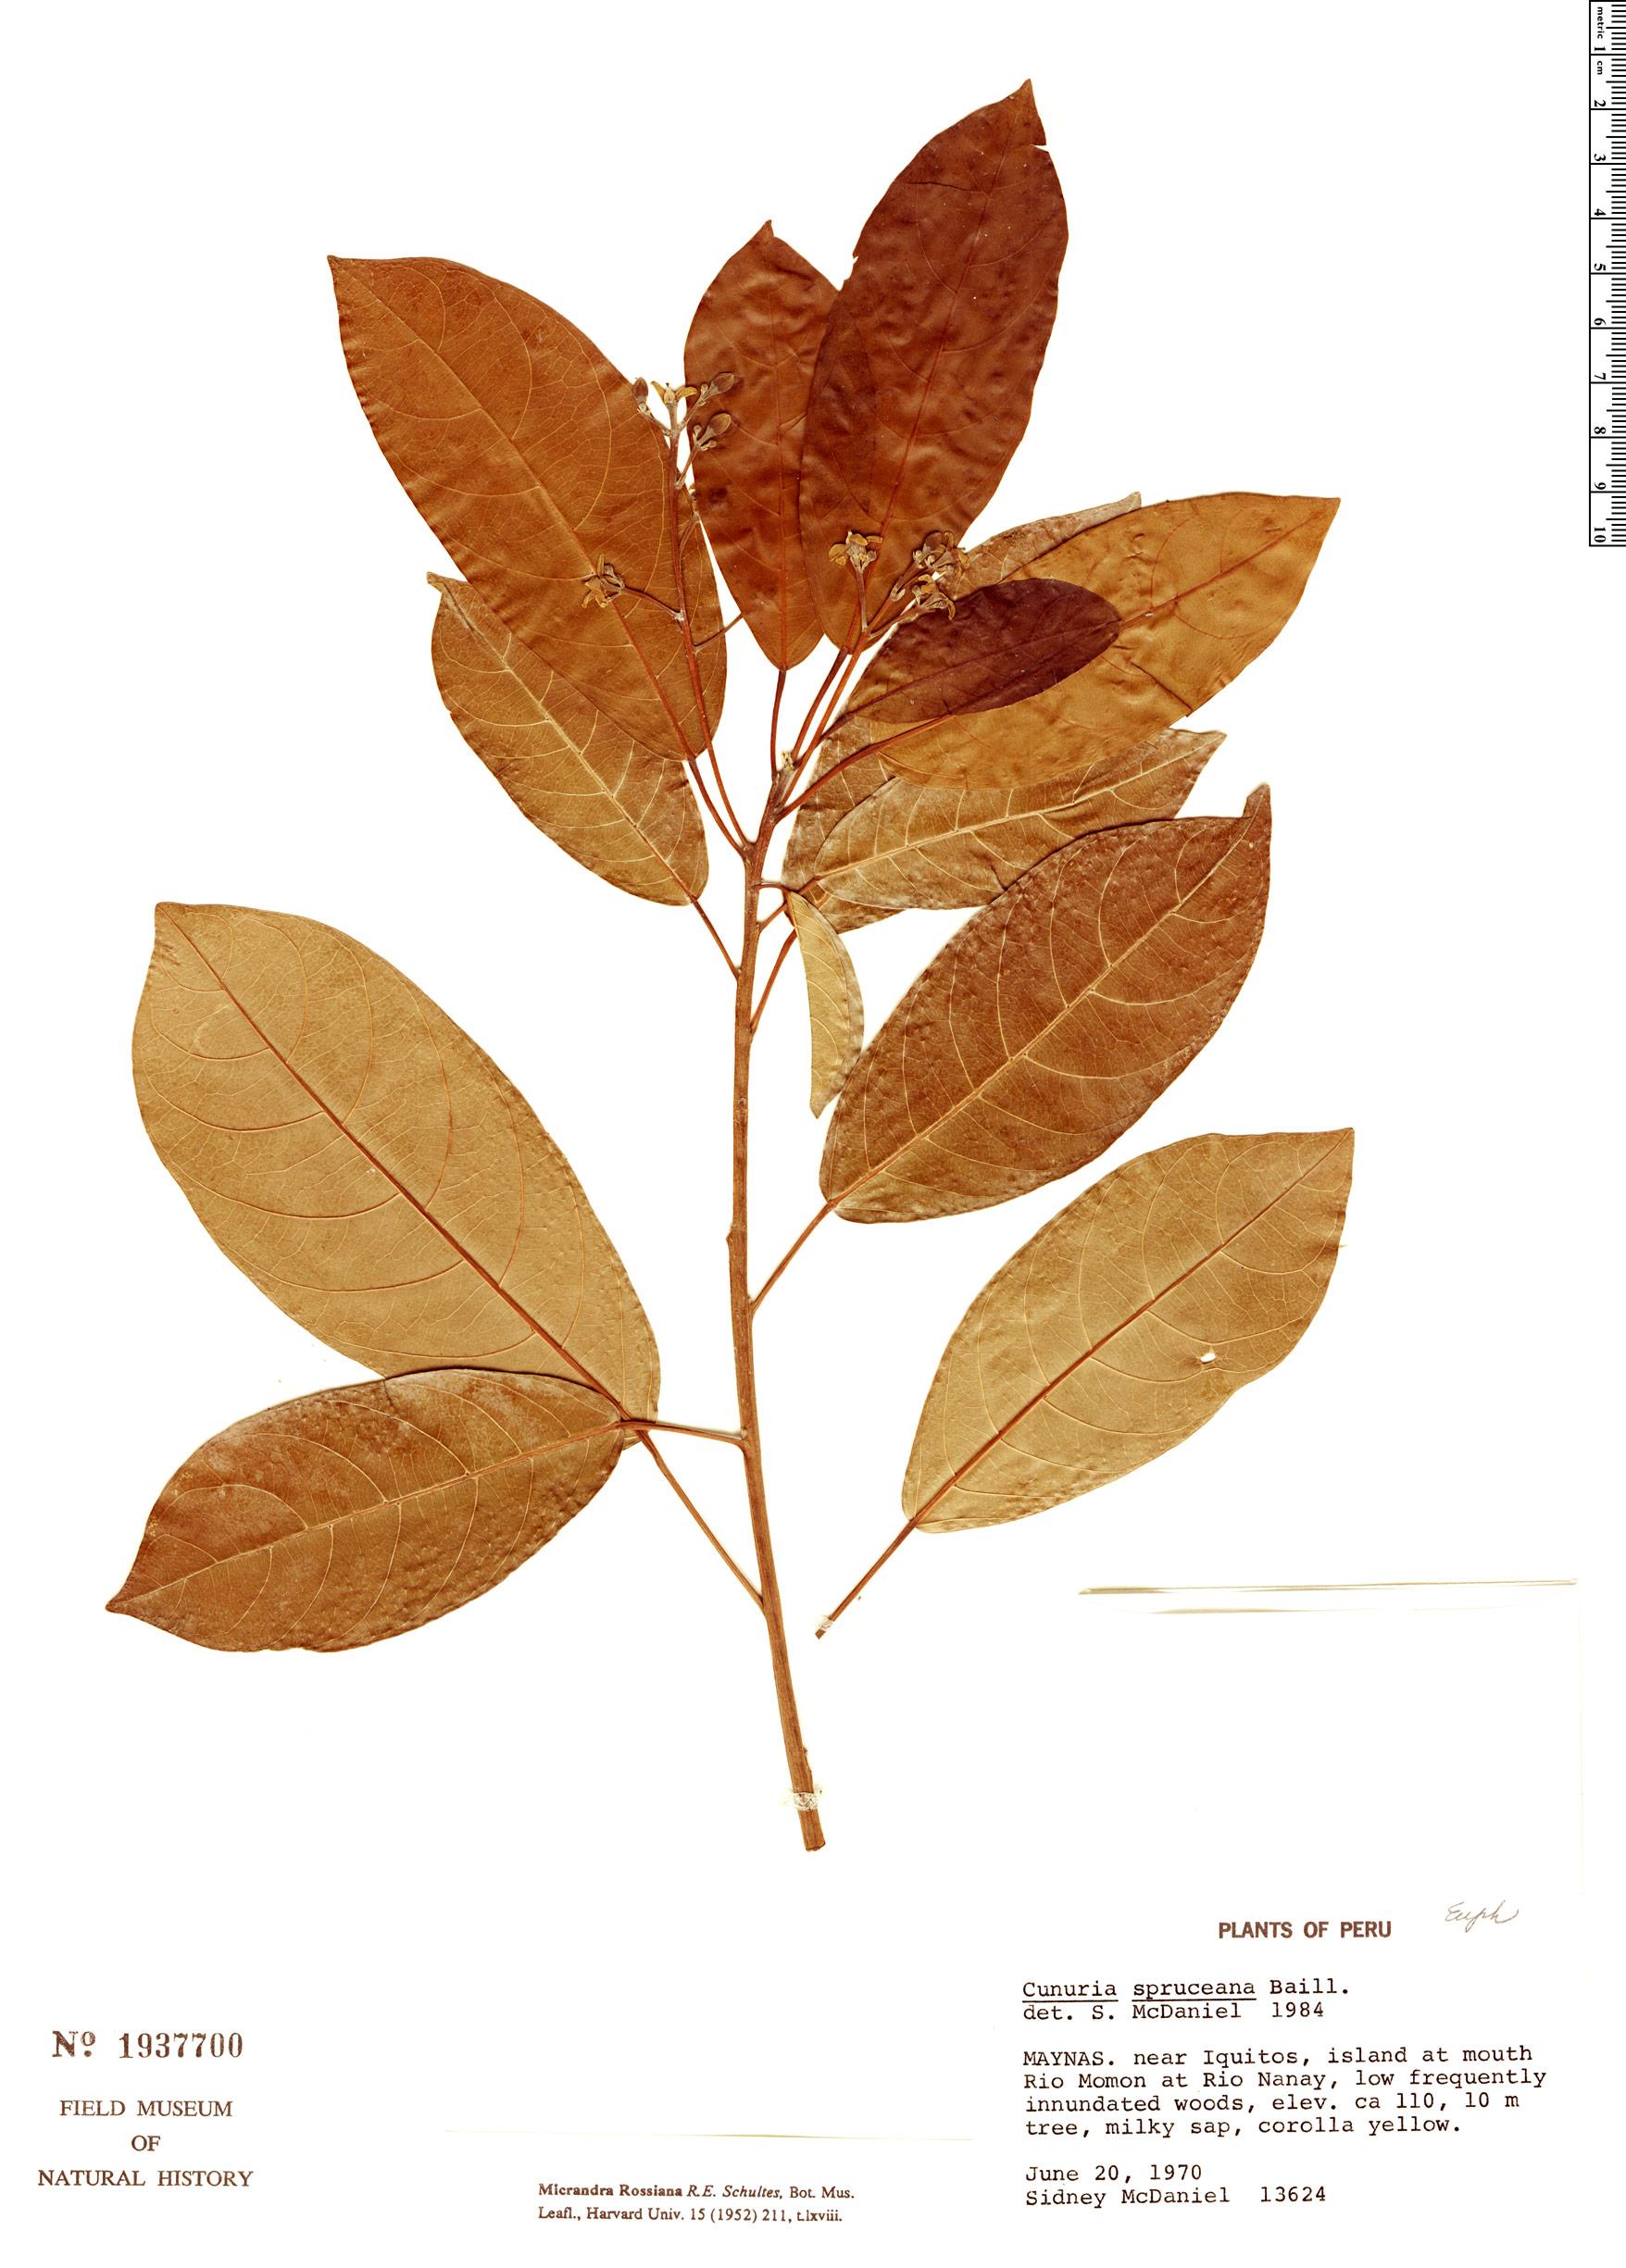 Specimen: Micrandra rossiana